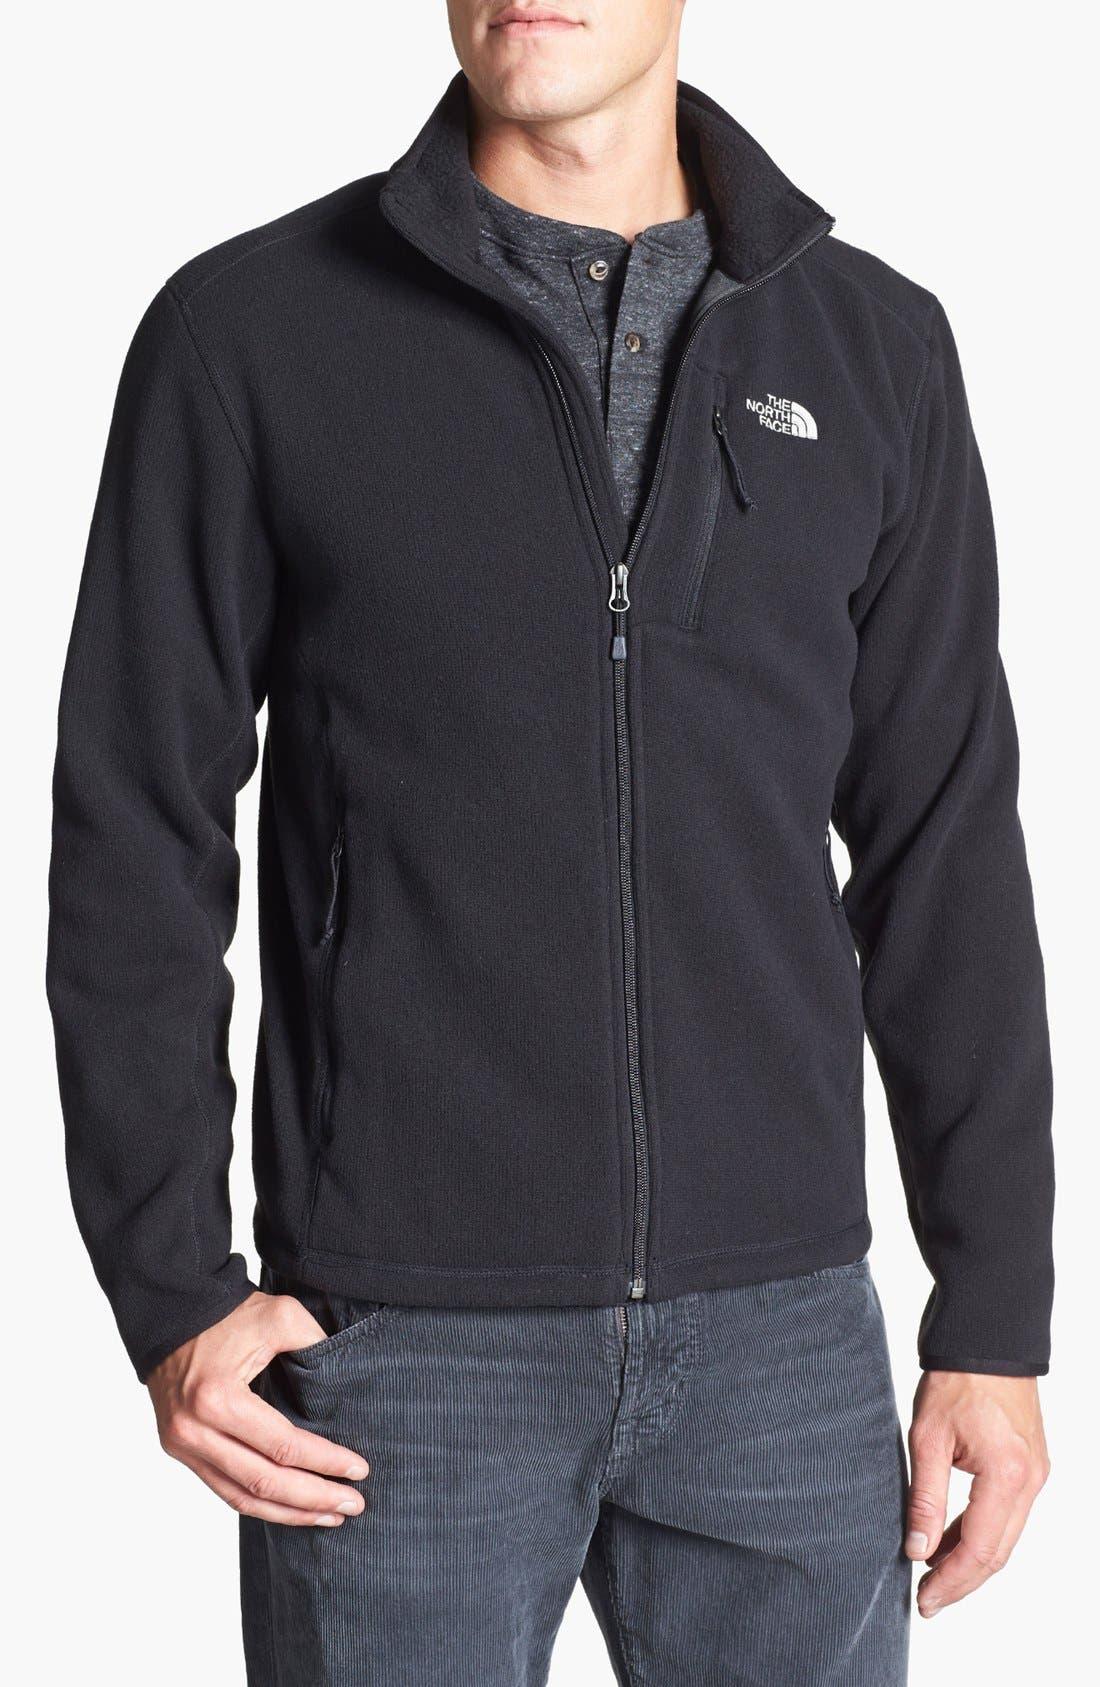 Alternate Image 1 Selected - The North Face 'Gordon Lyons' Sweater Knit Fleece Jacket